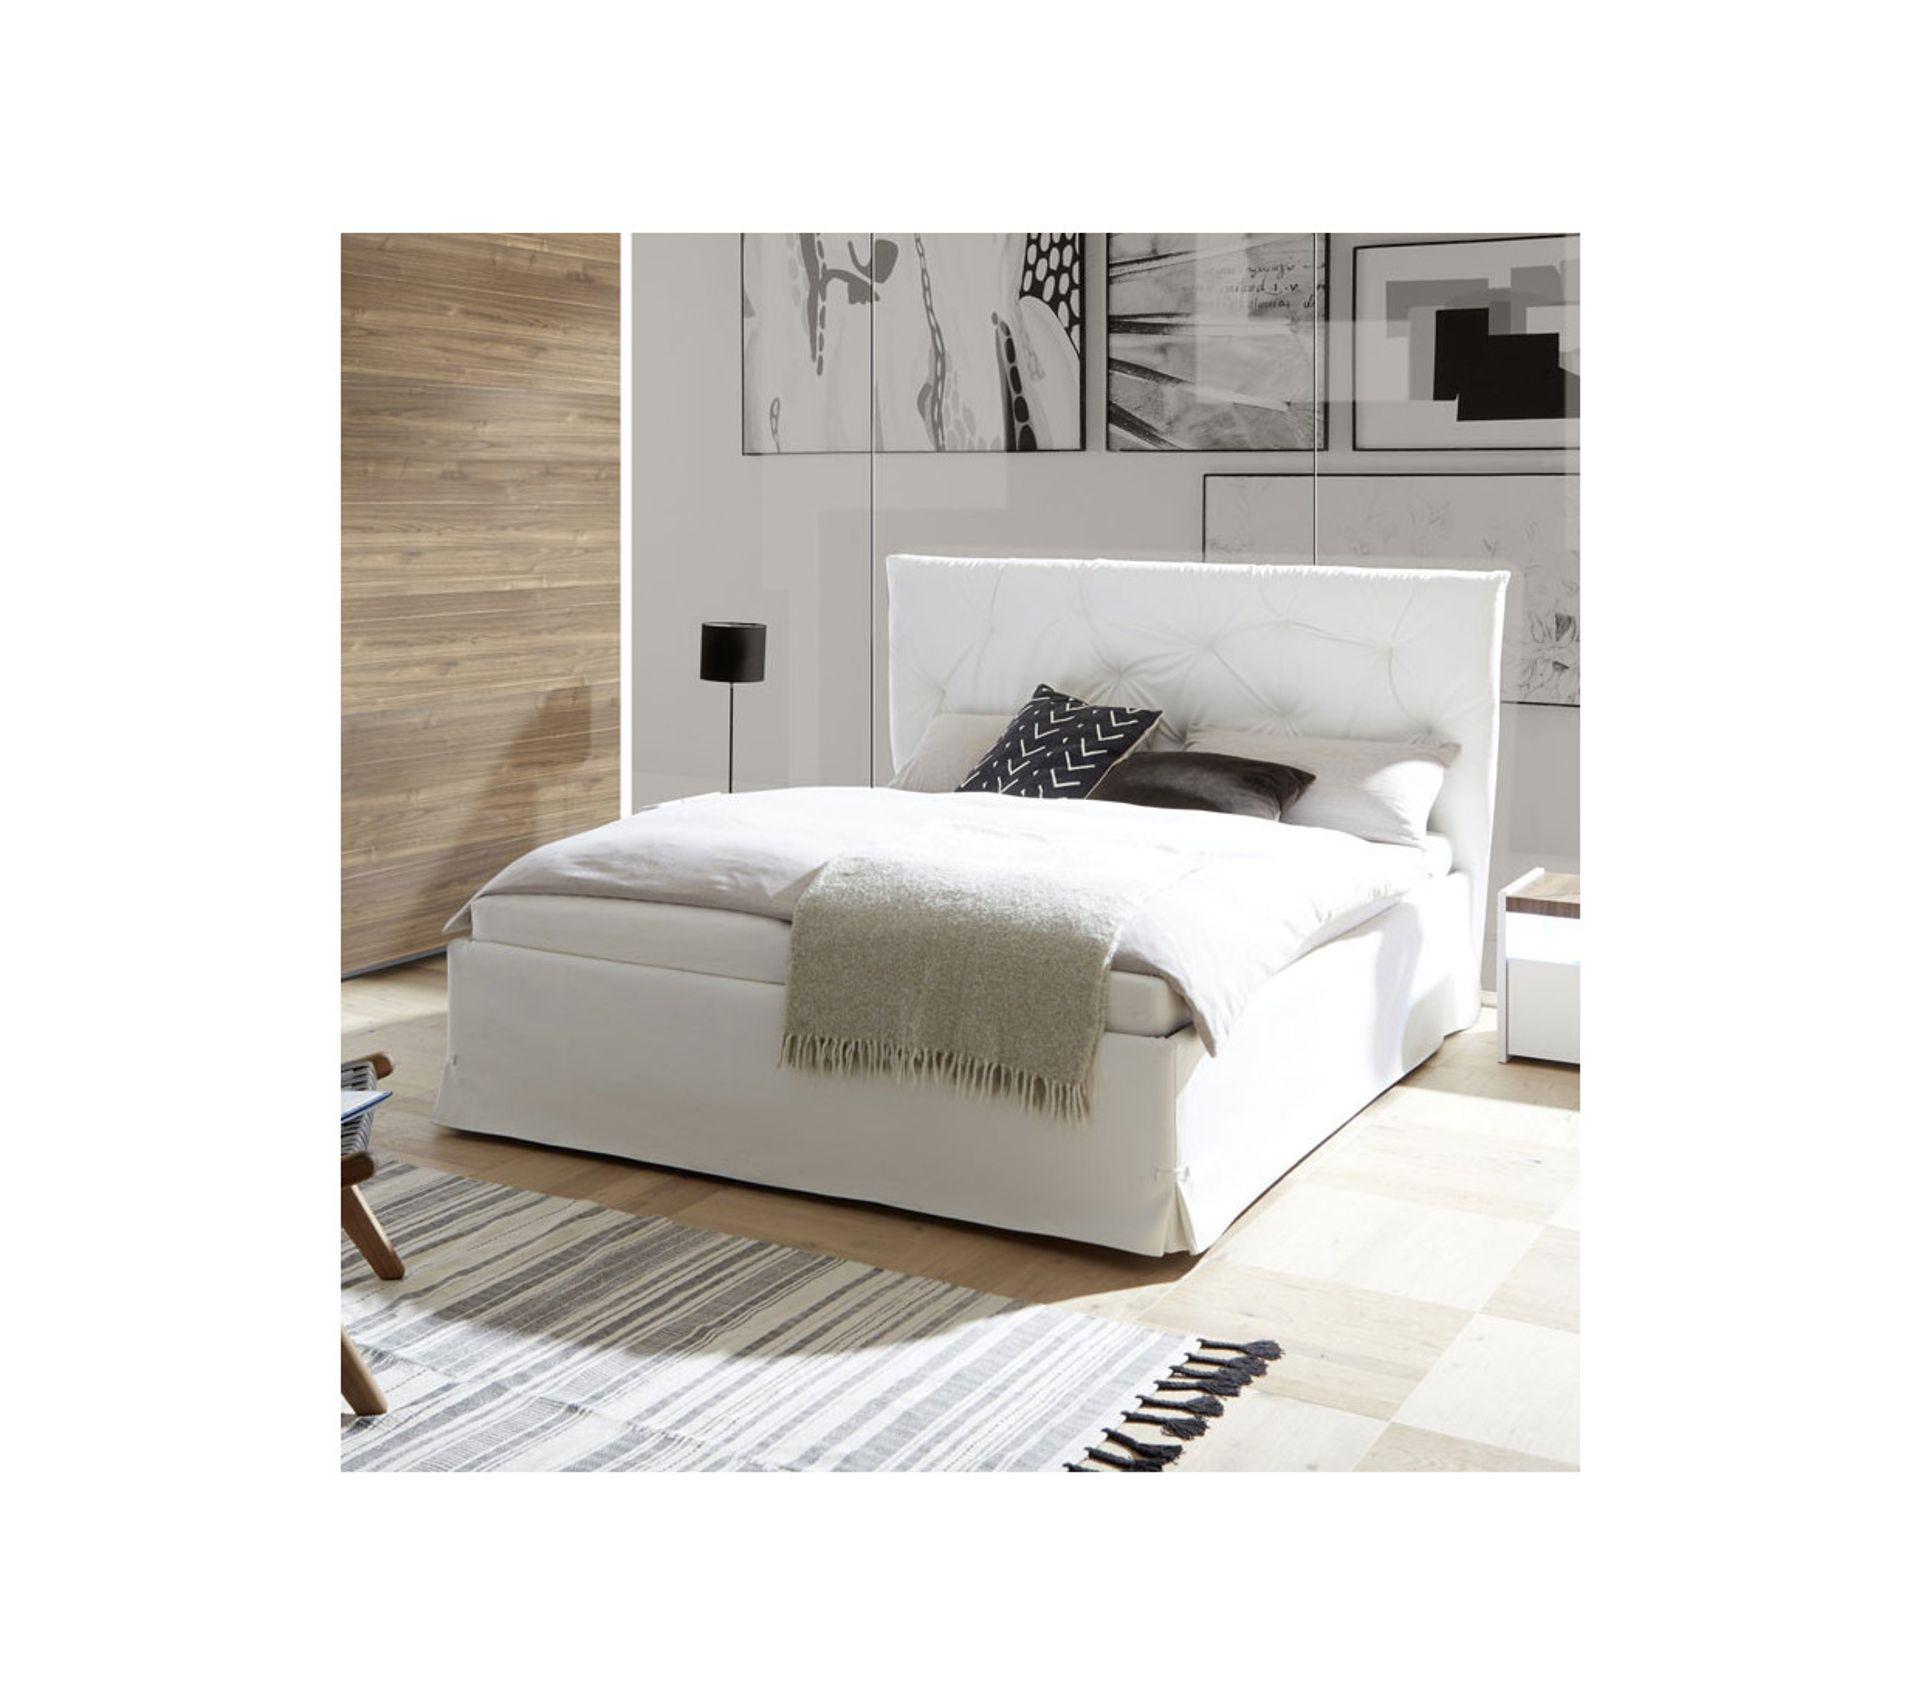 cadre  tête de lit 160200 cm simili cuir blanc  aniece